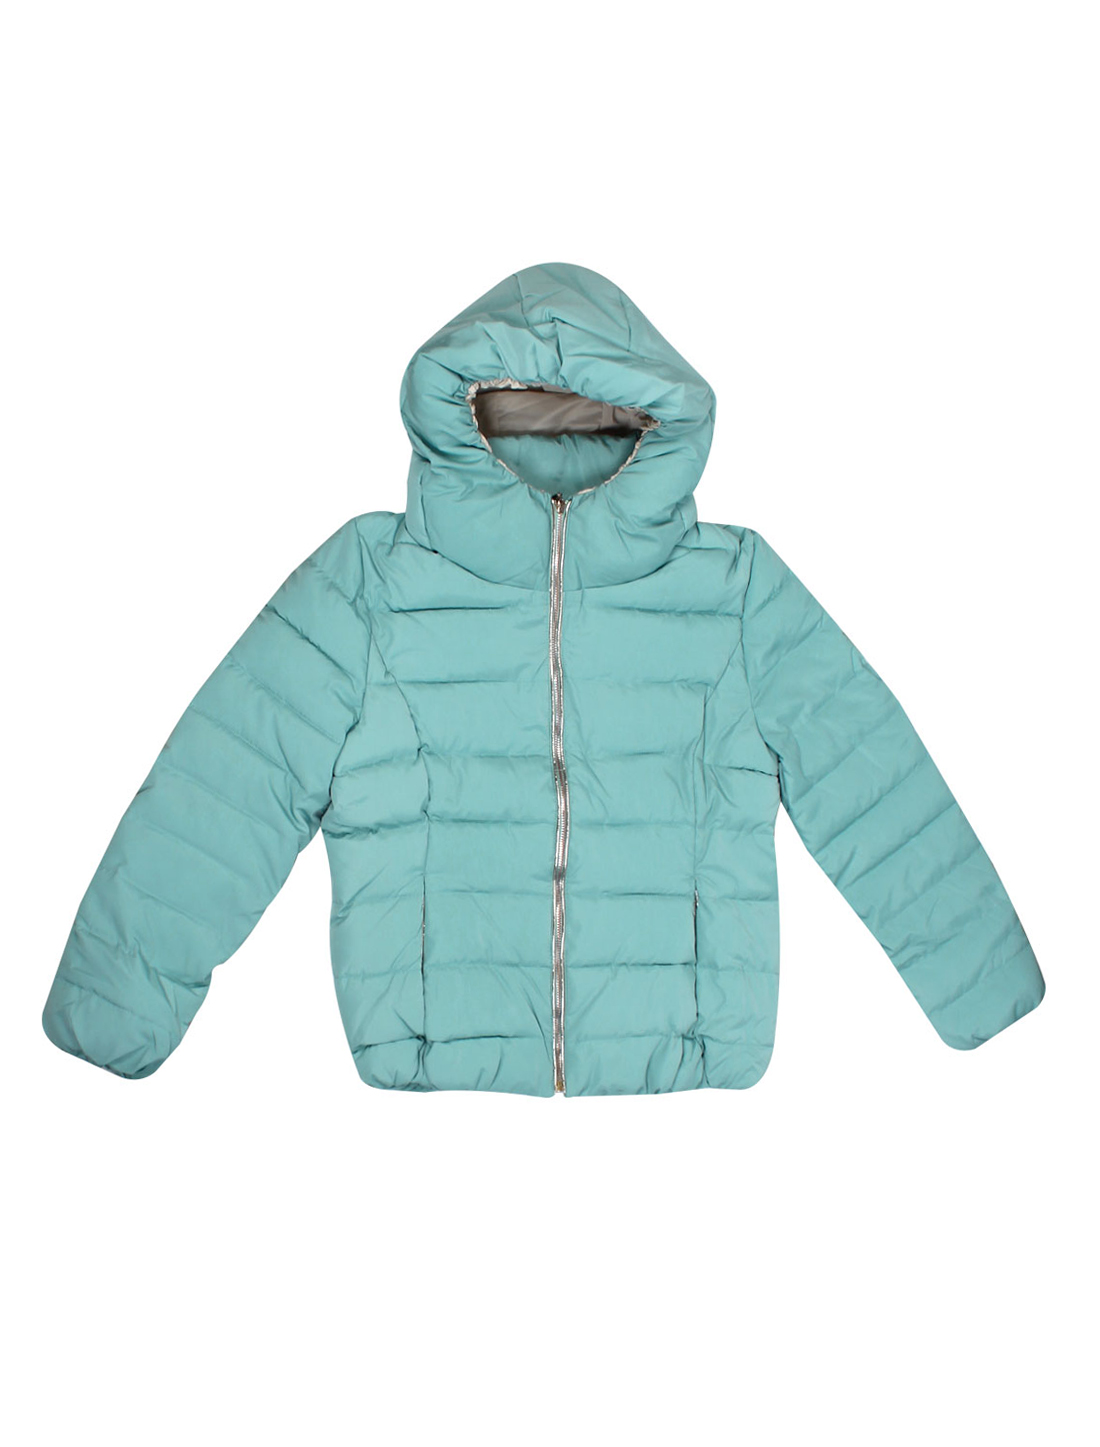 Zip Closure Long Sleeves Aqua Hooded Padded Coat for Lady L